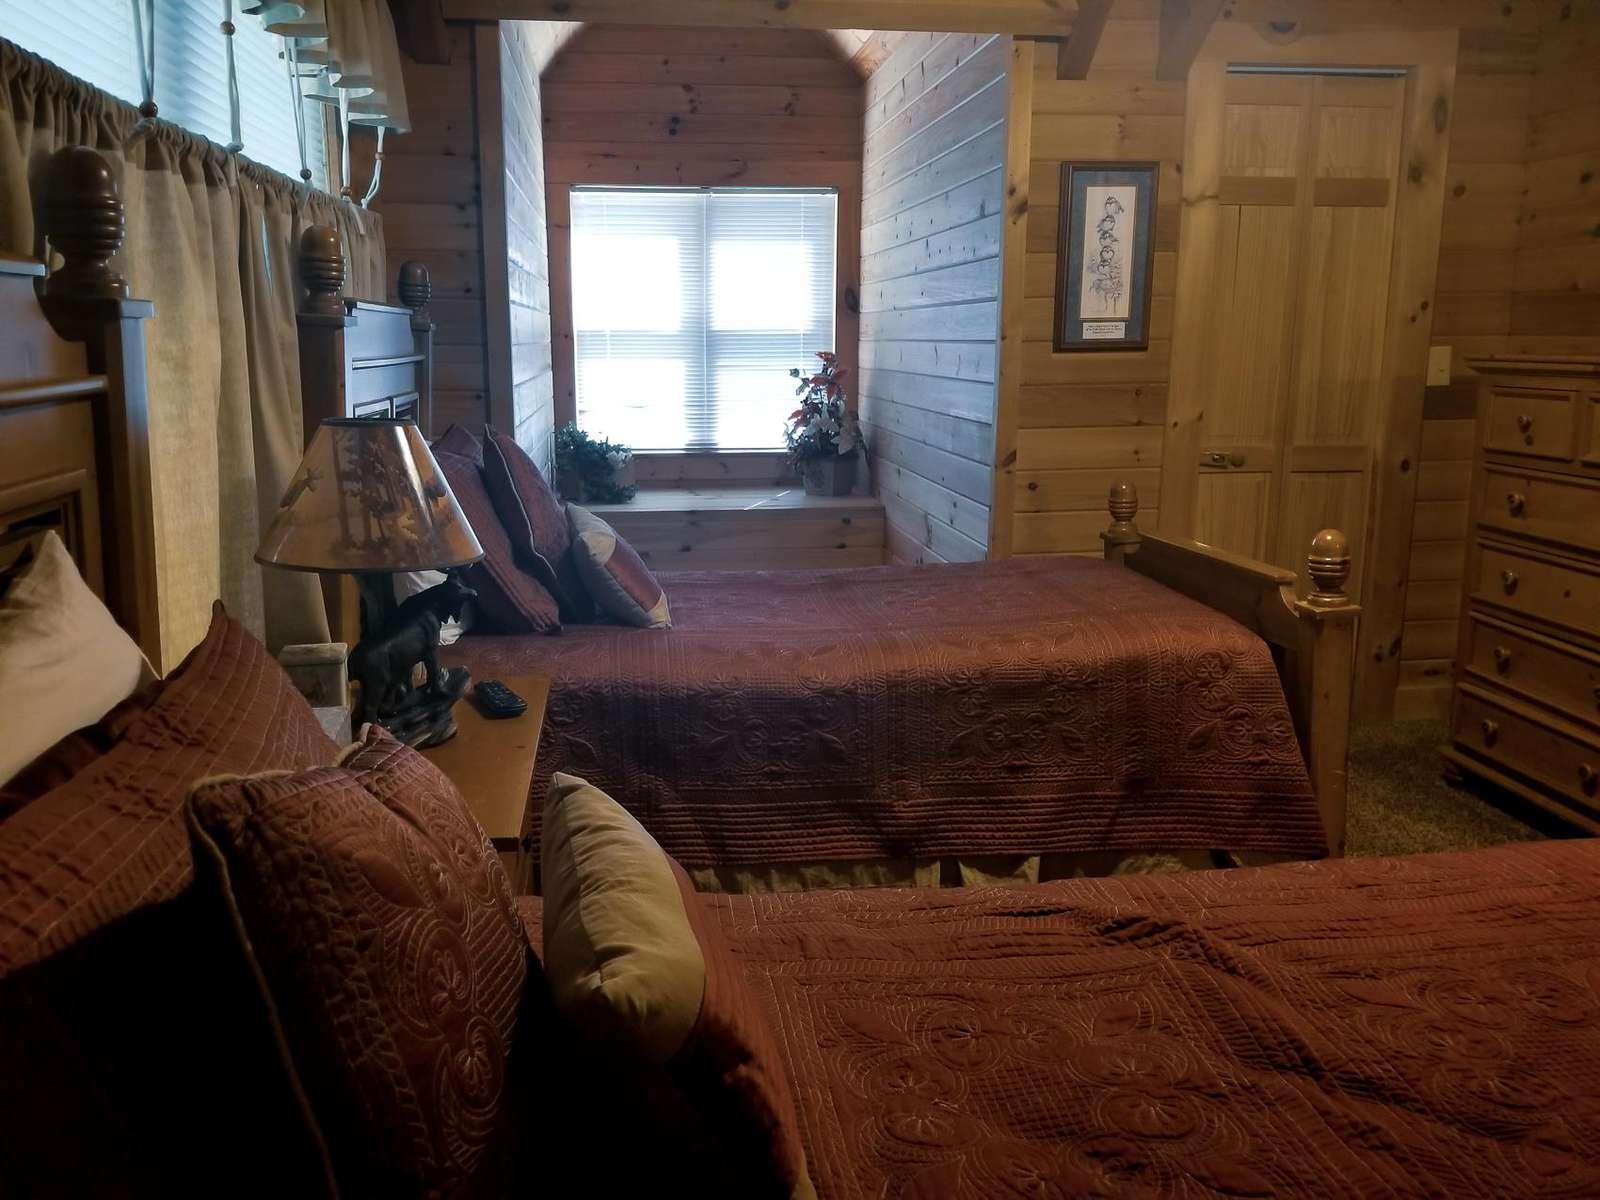 Window Seat in Upstairs Bedroom